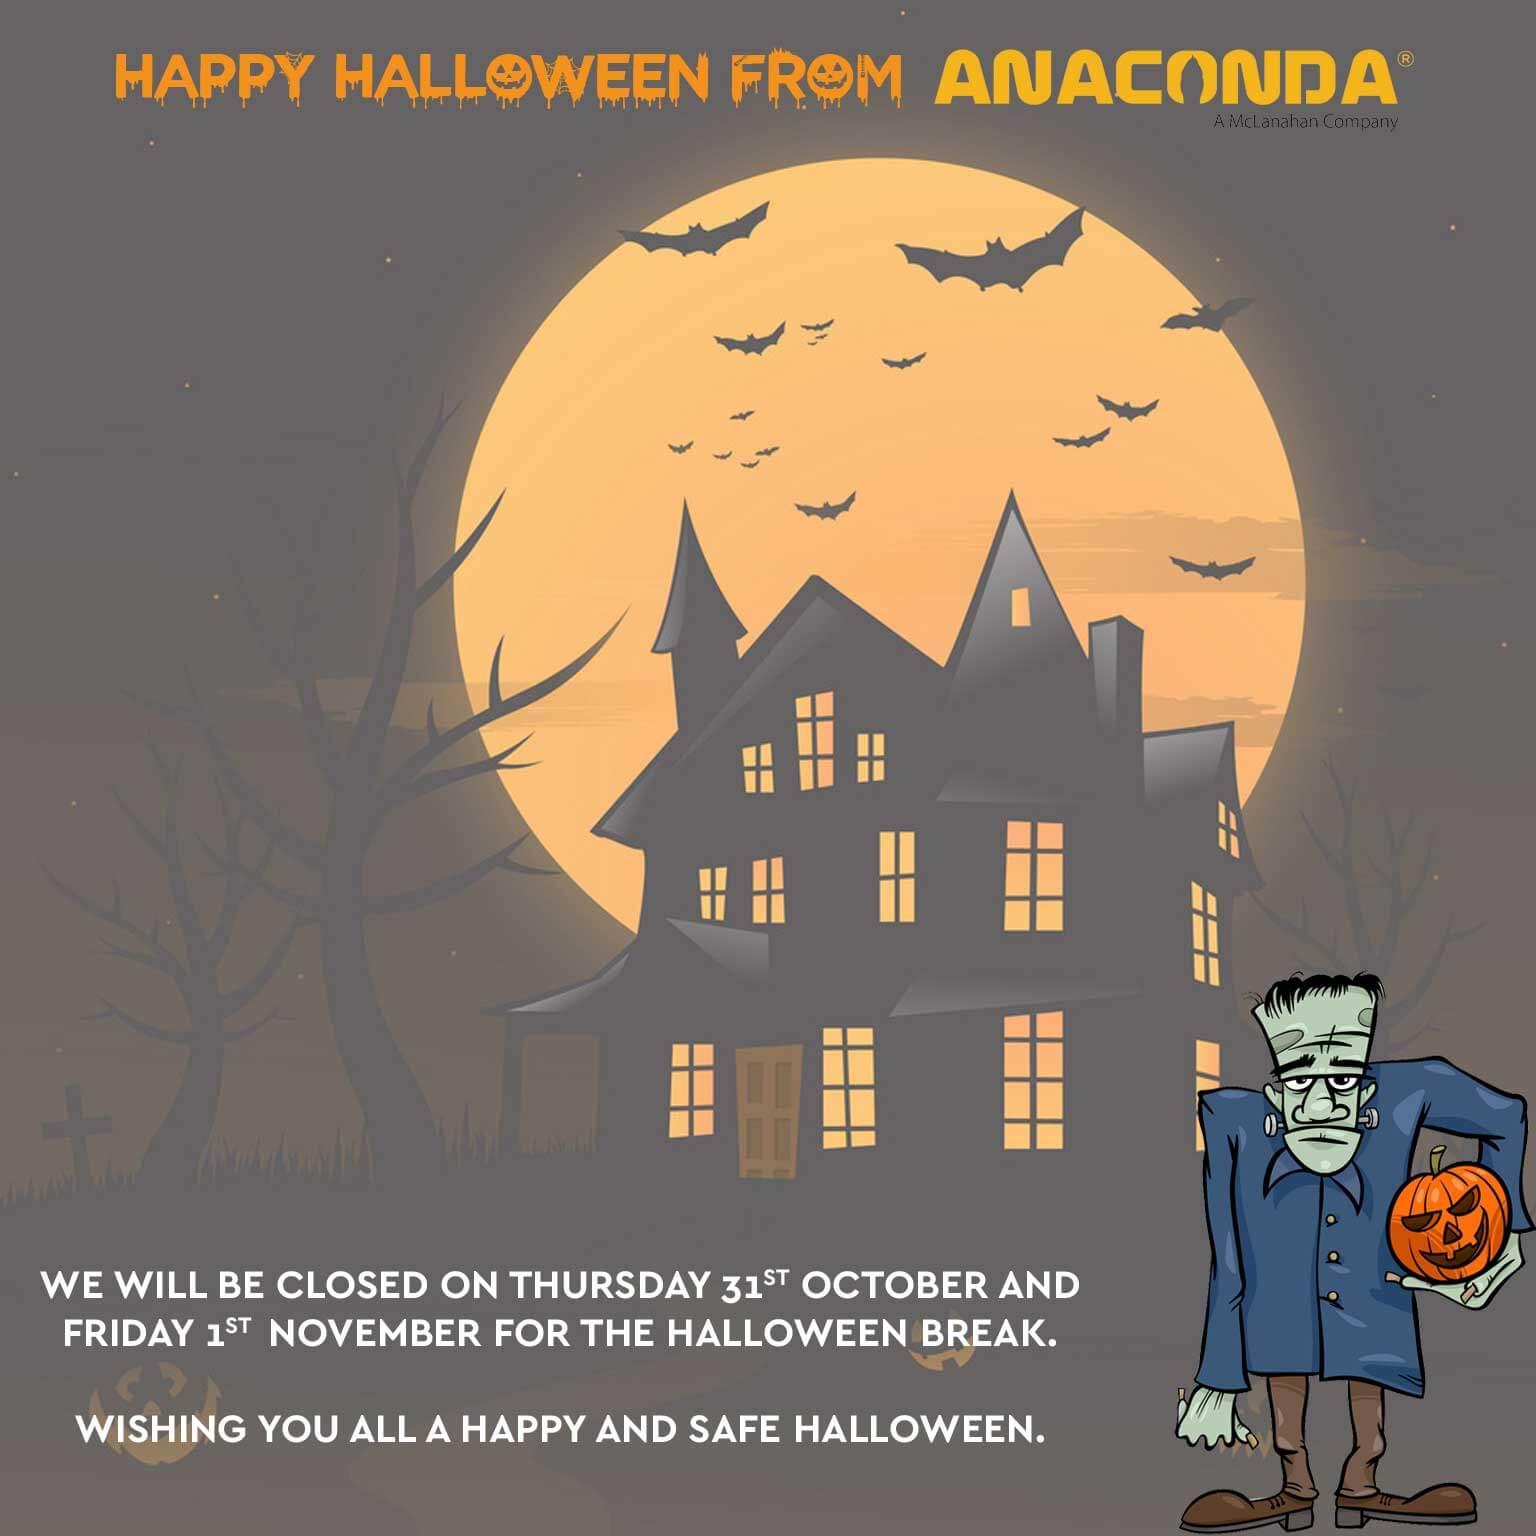 Anaconda Equipment - Halloween Break Closure 2020